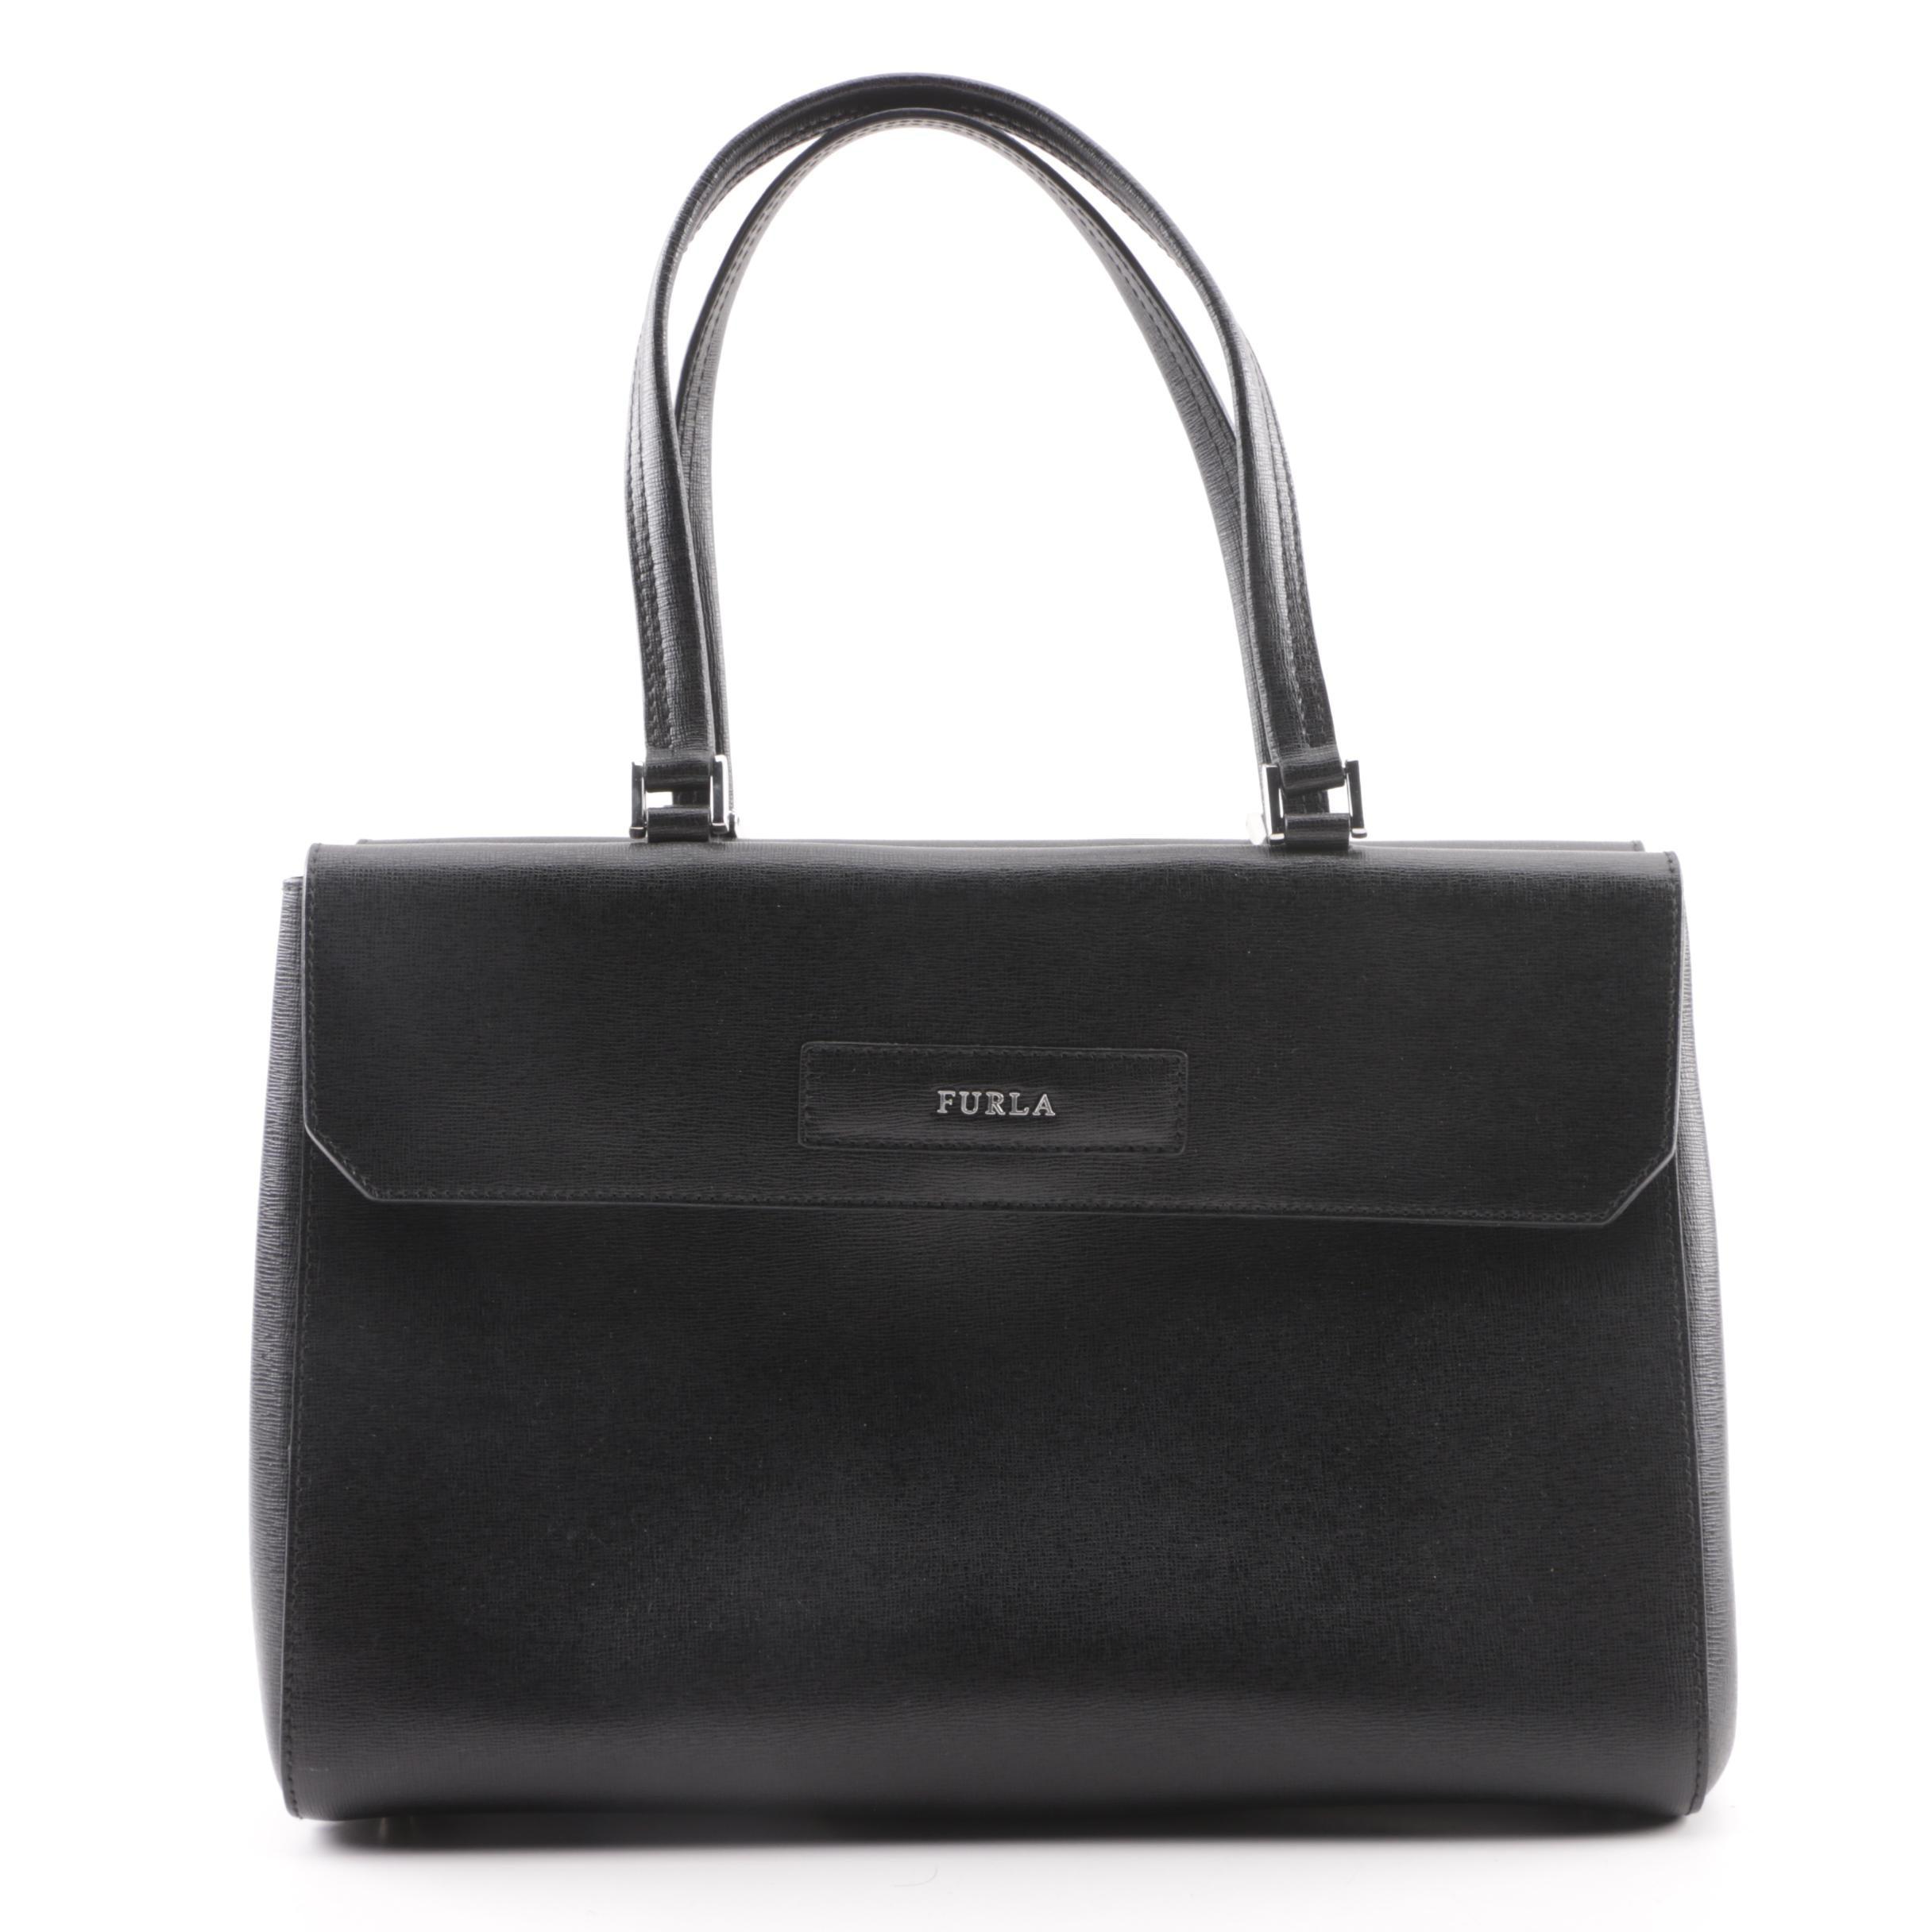 Furla Black Leather Handbag